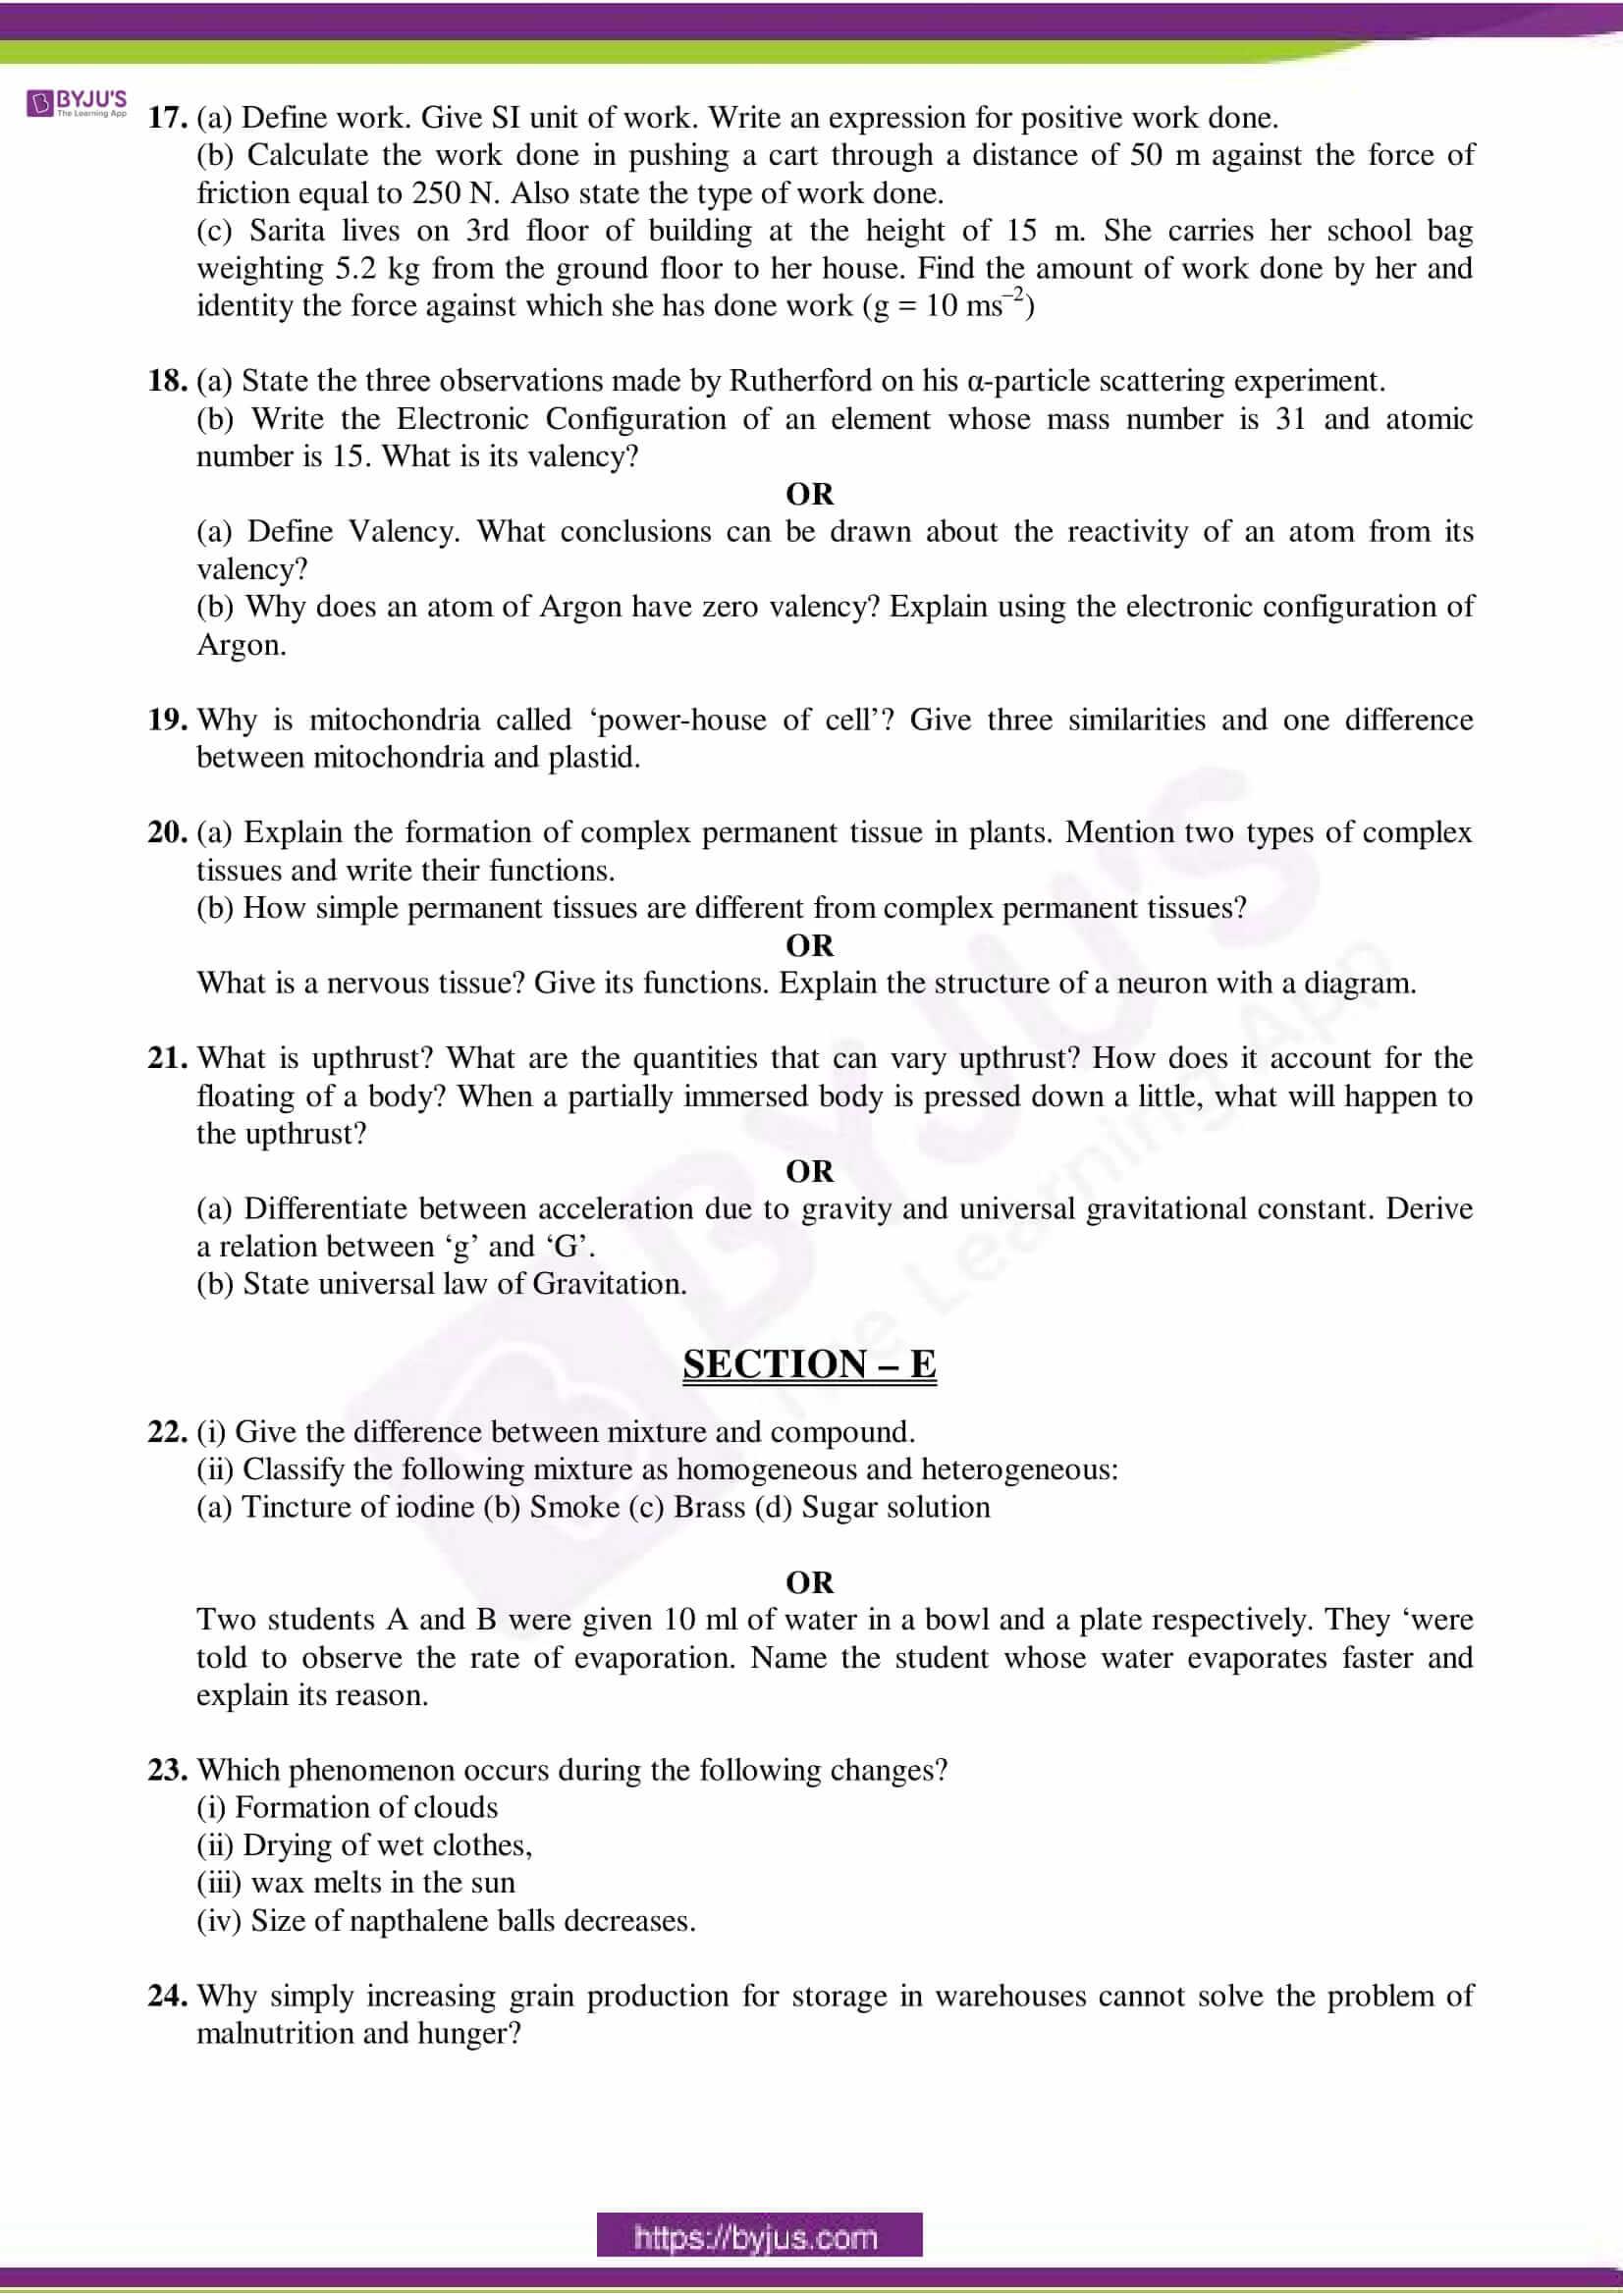 cbse sample paper class 9 science set 9